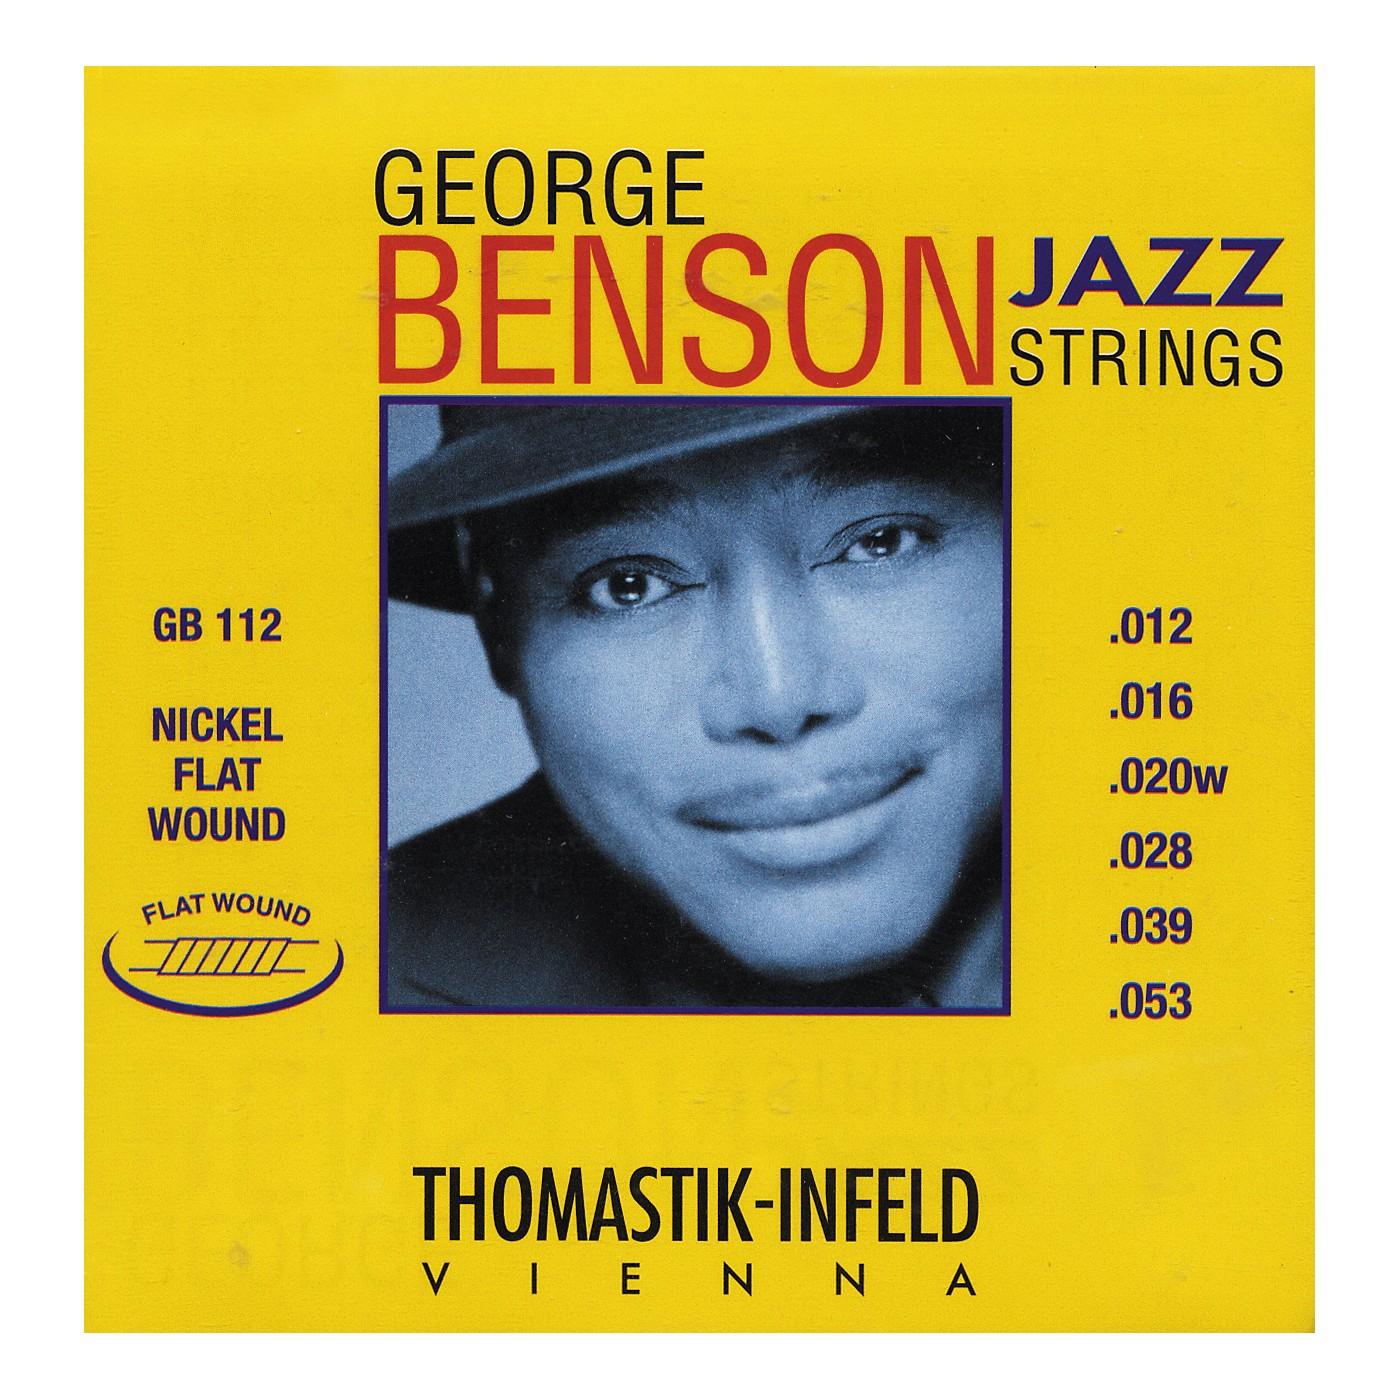 Thomastik GB112 Medium Light George Benson Custom Flatwound Guitar Strings thumbnail